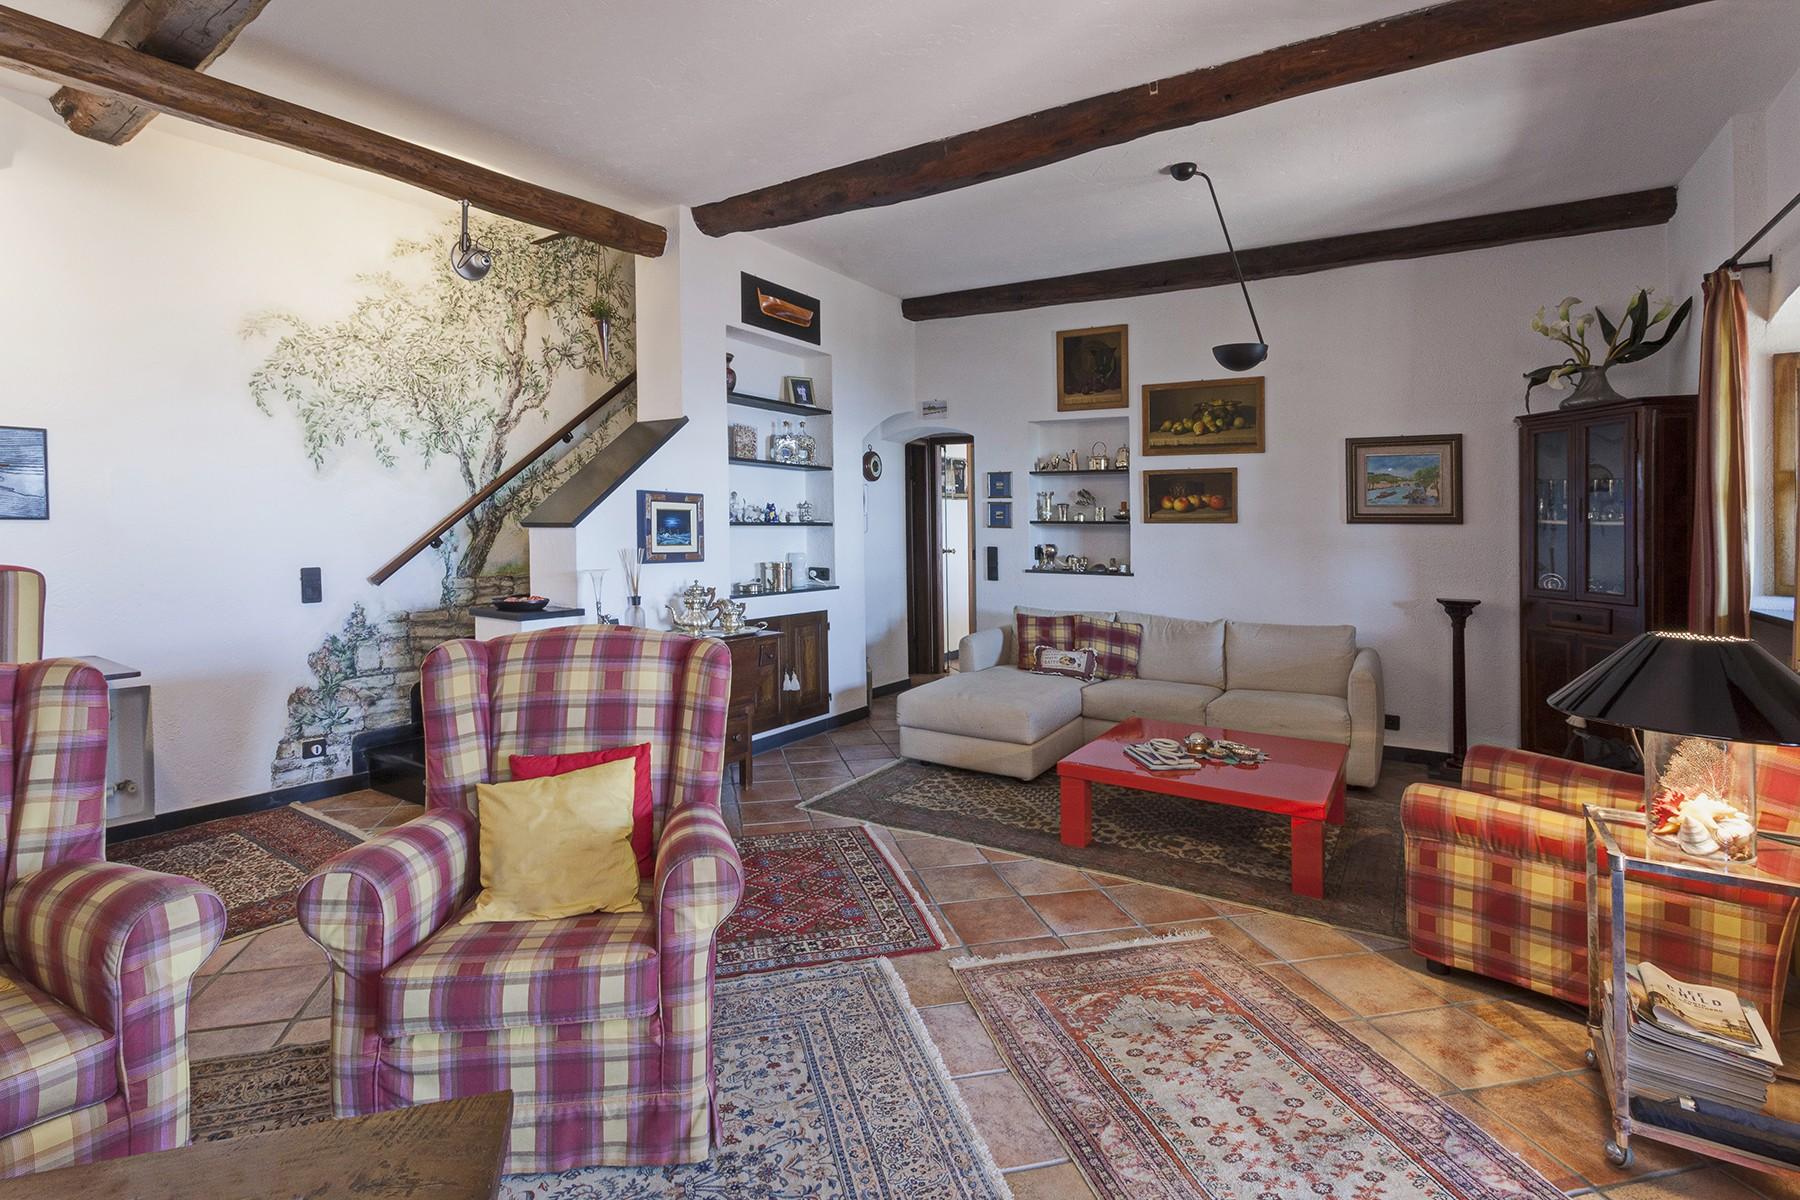 Villa in Vendita a Santa Margherita Ligure: 5 locali, 180 mq - Foto 6